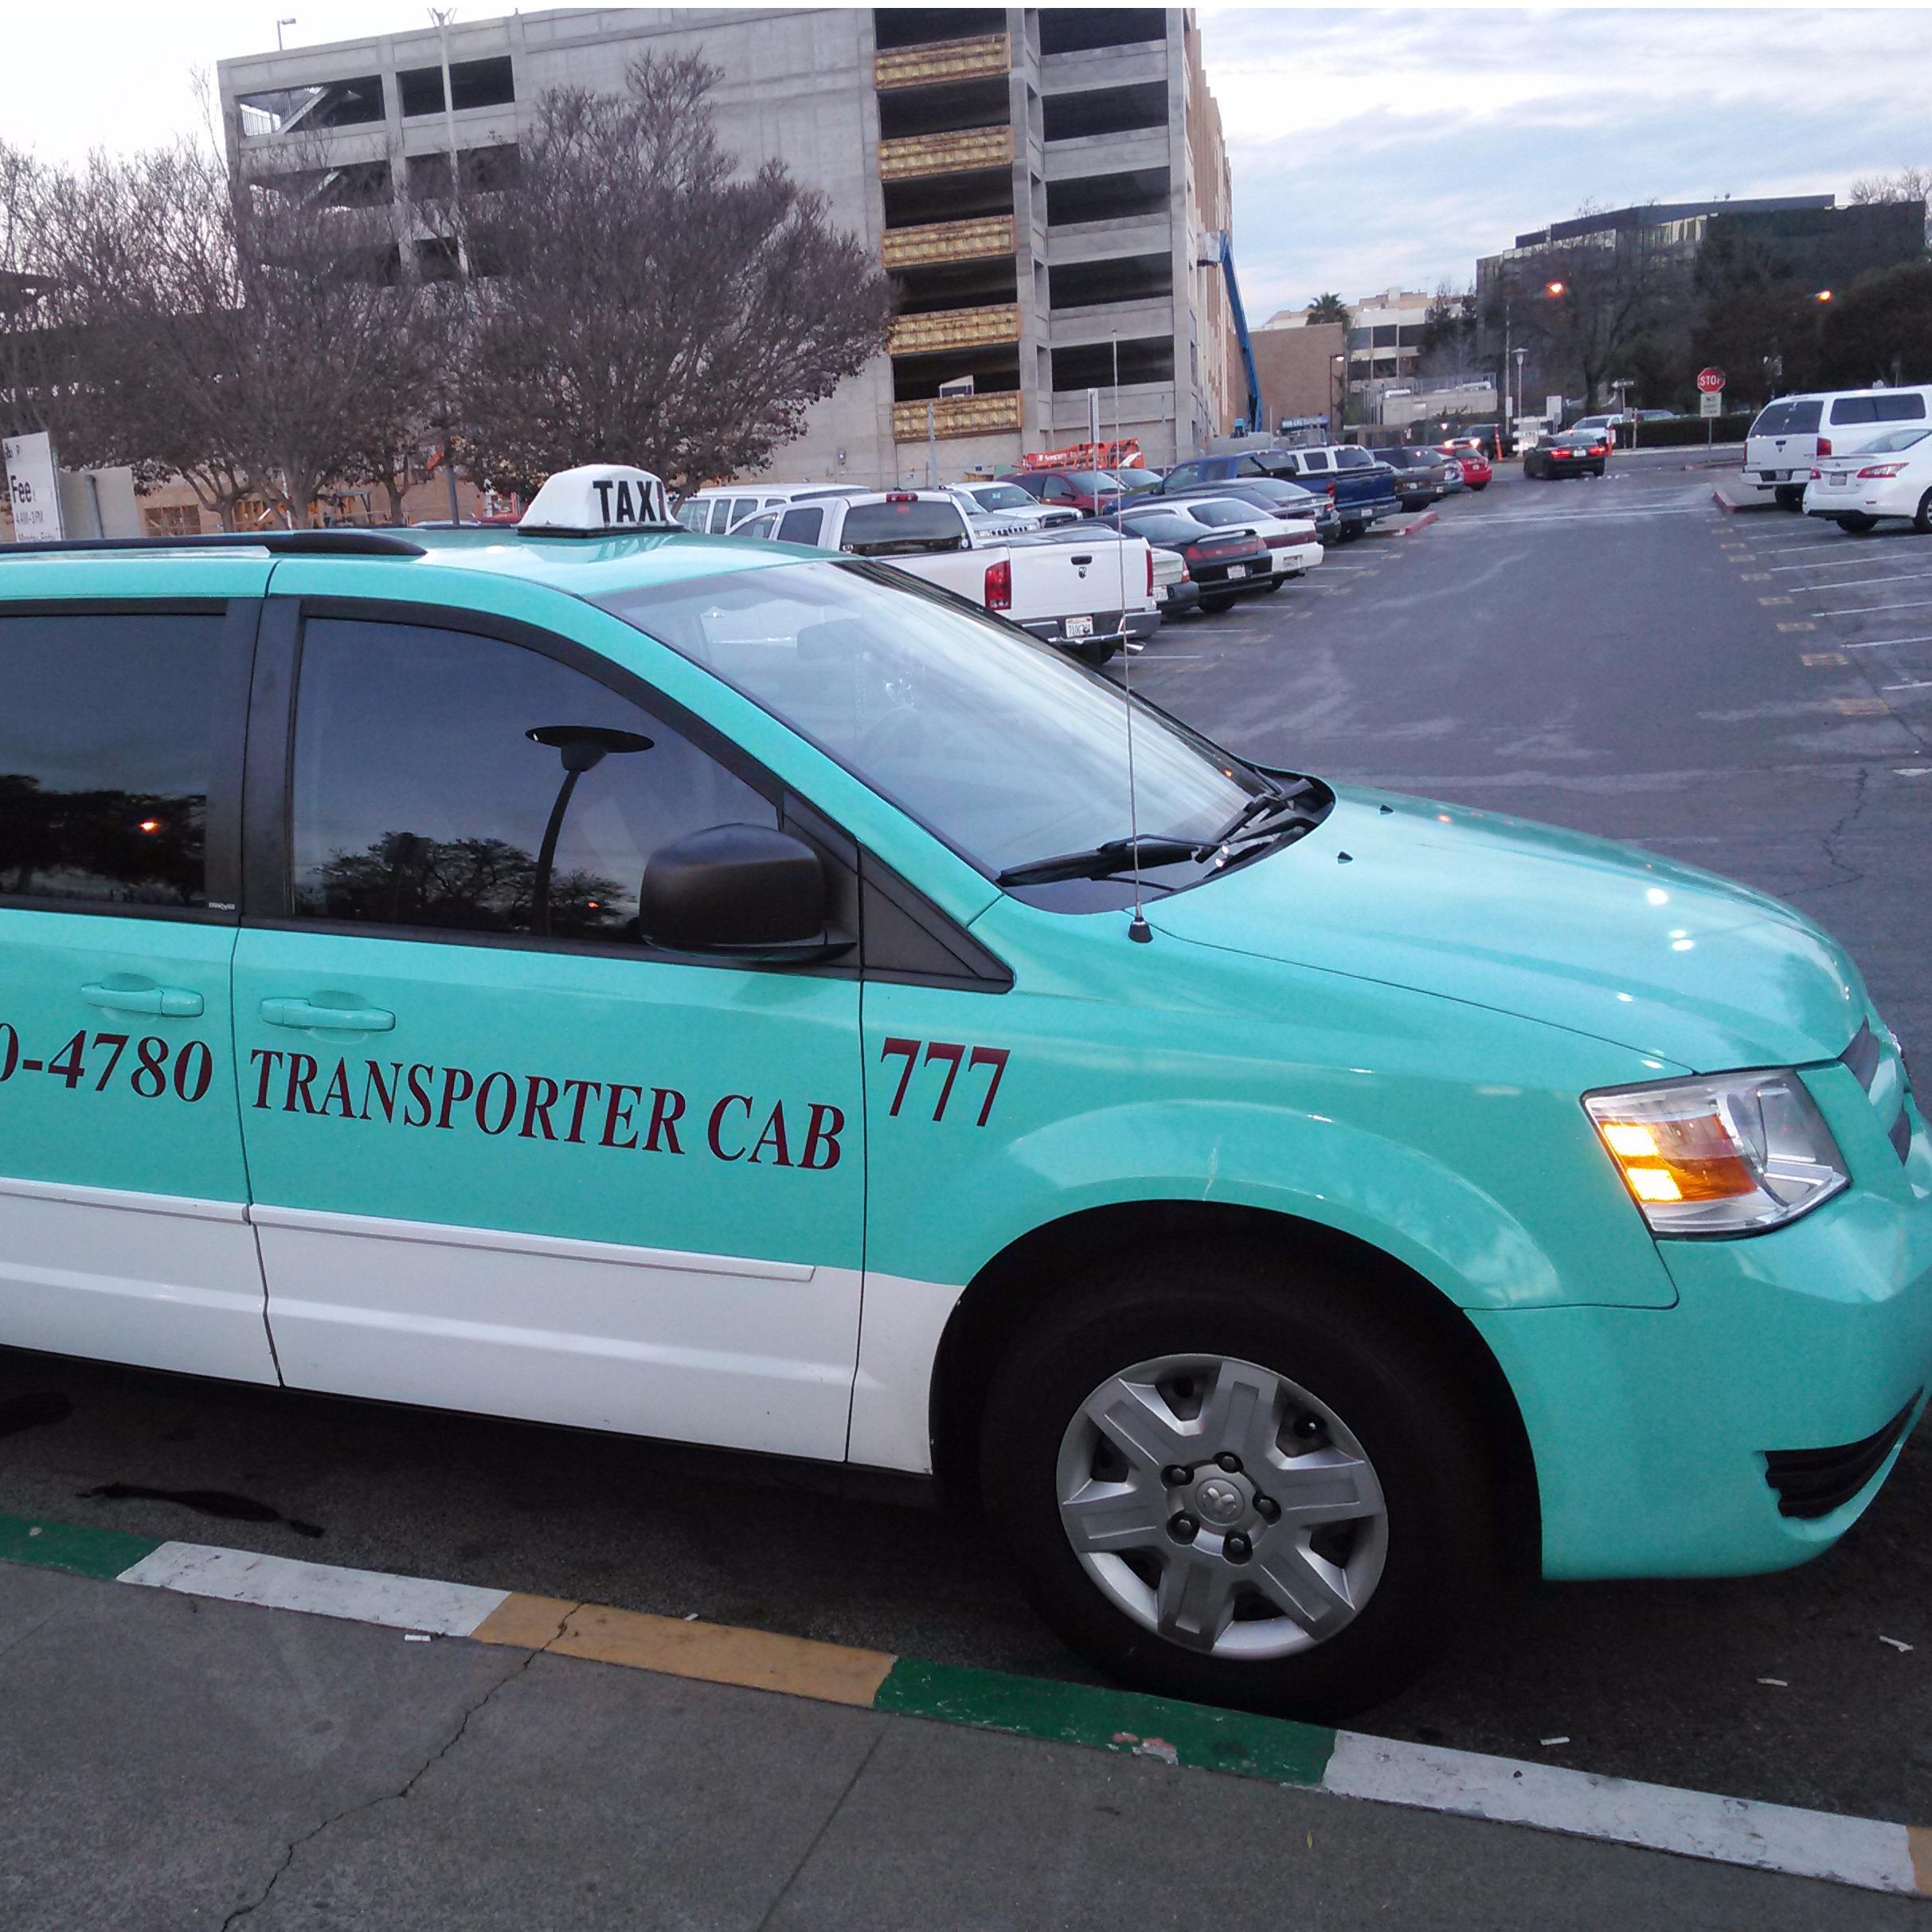 Transporter Cab